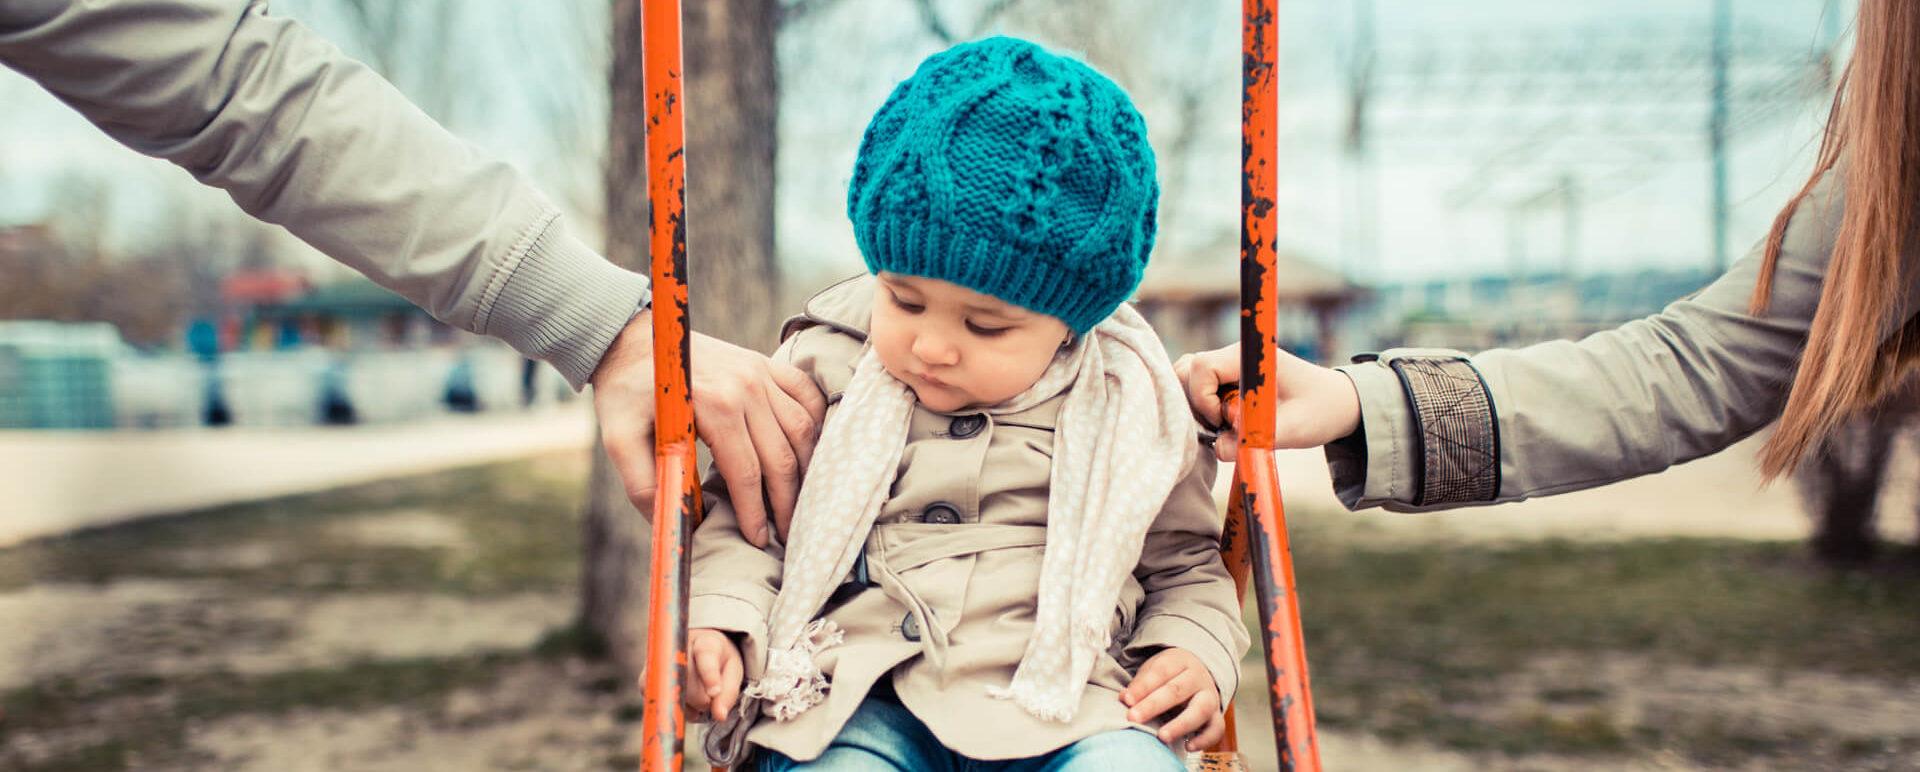 child custody, austin texas, family law, family law attorney, kelly j. capps